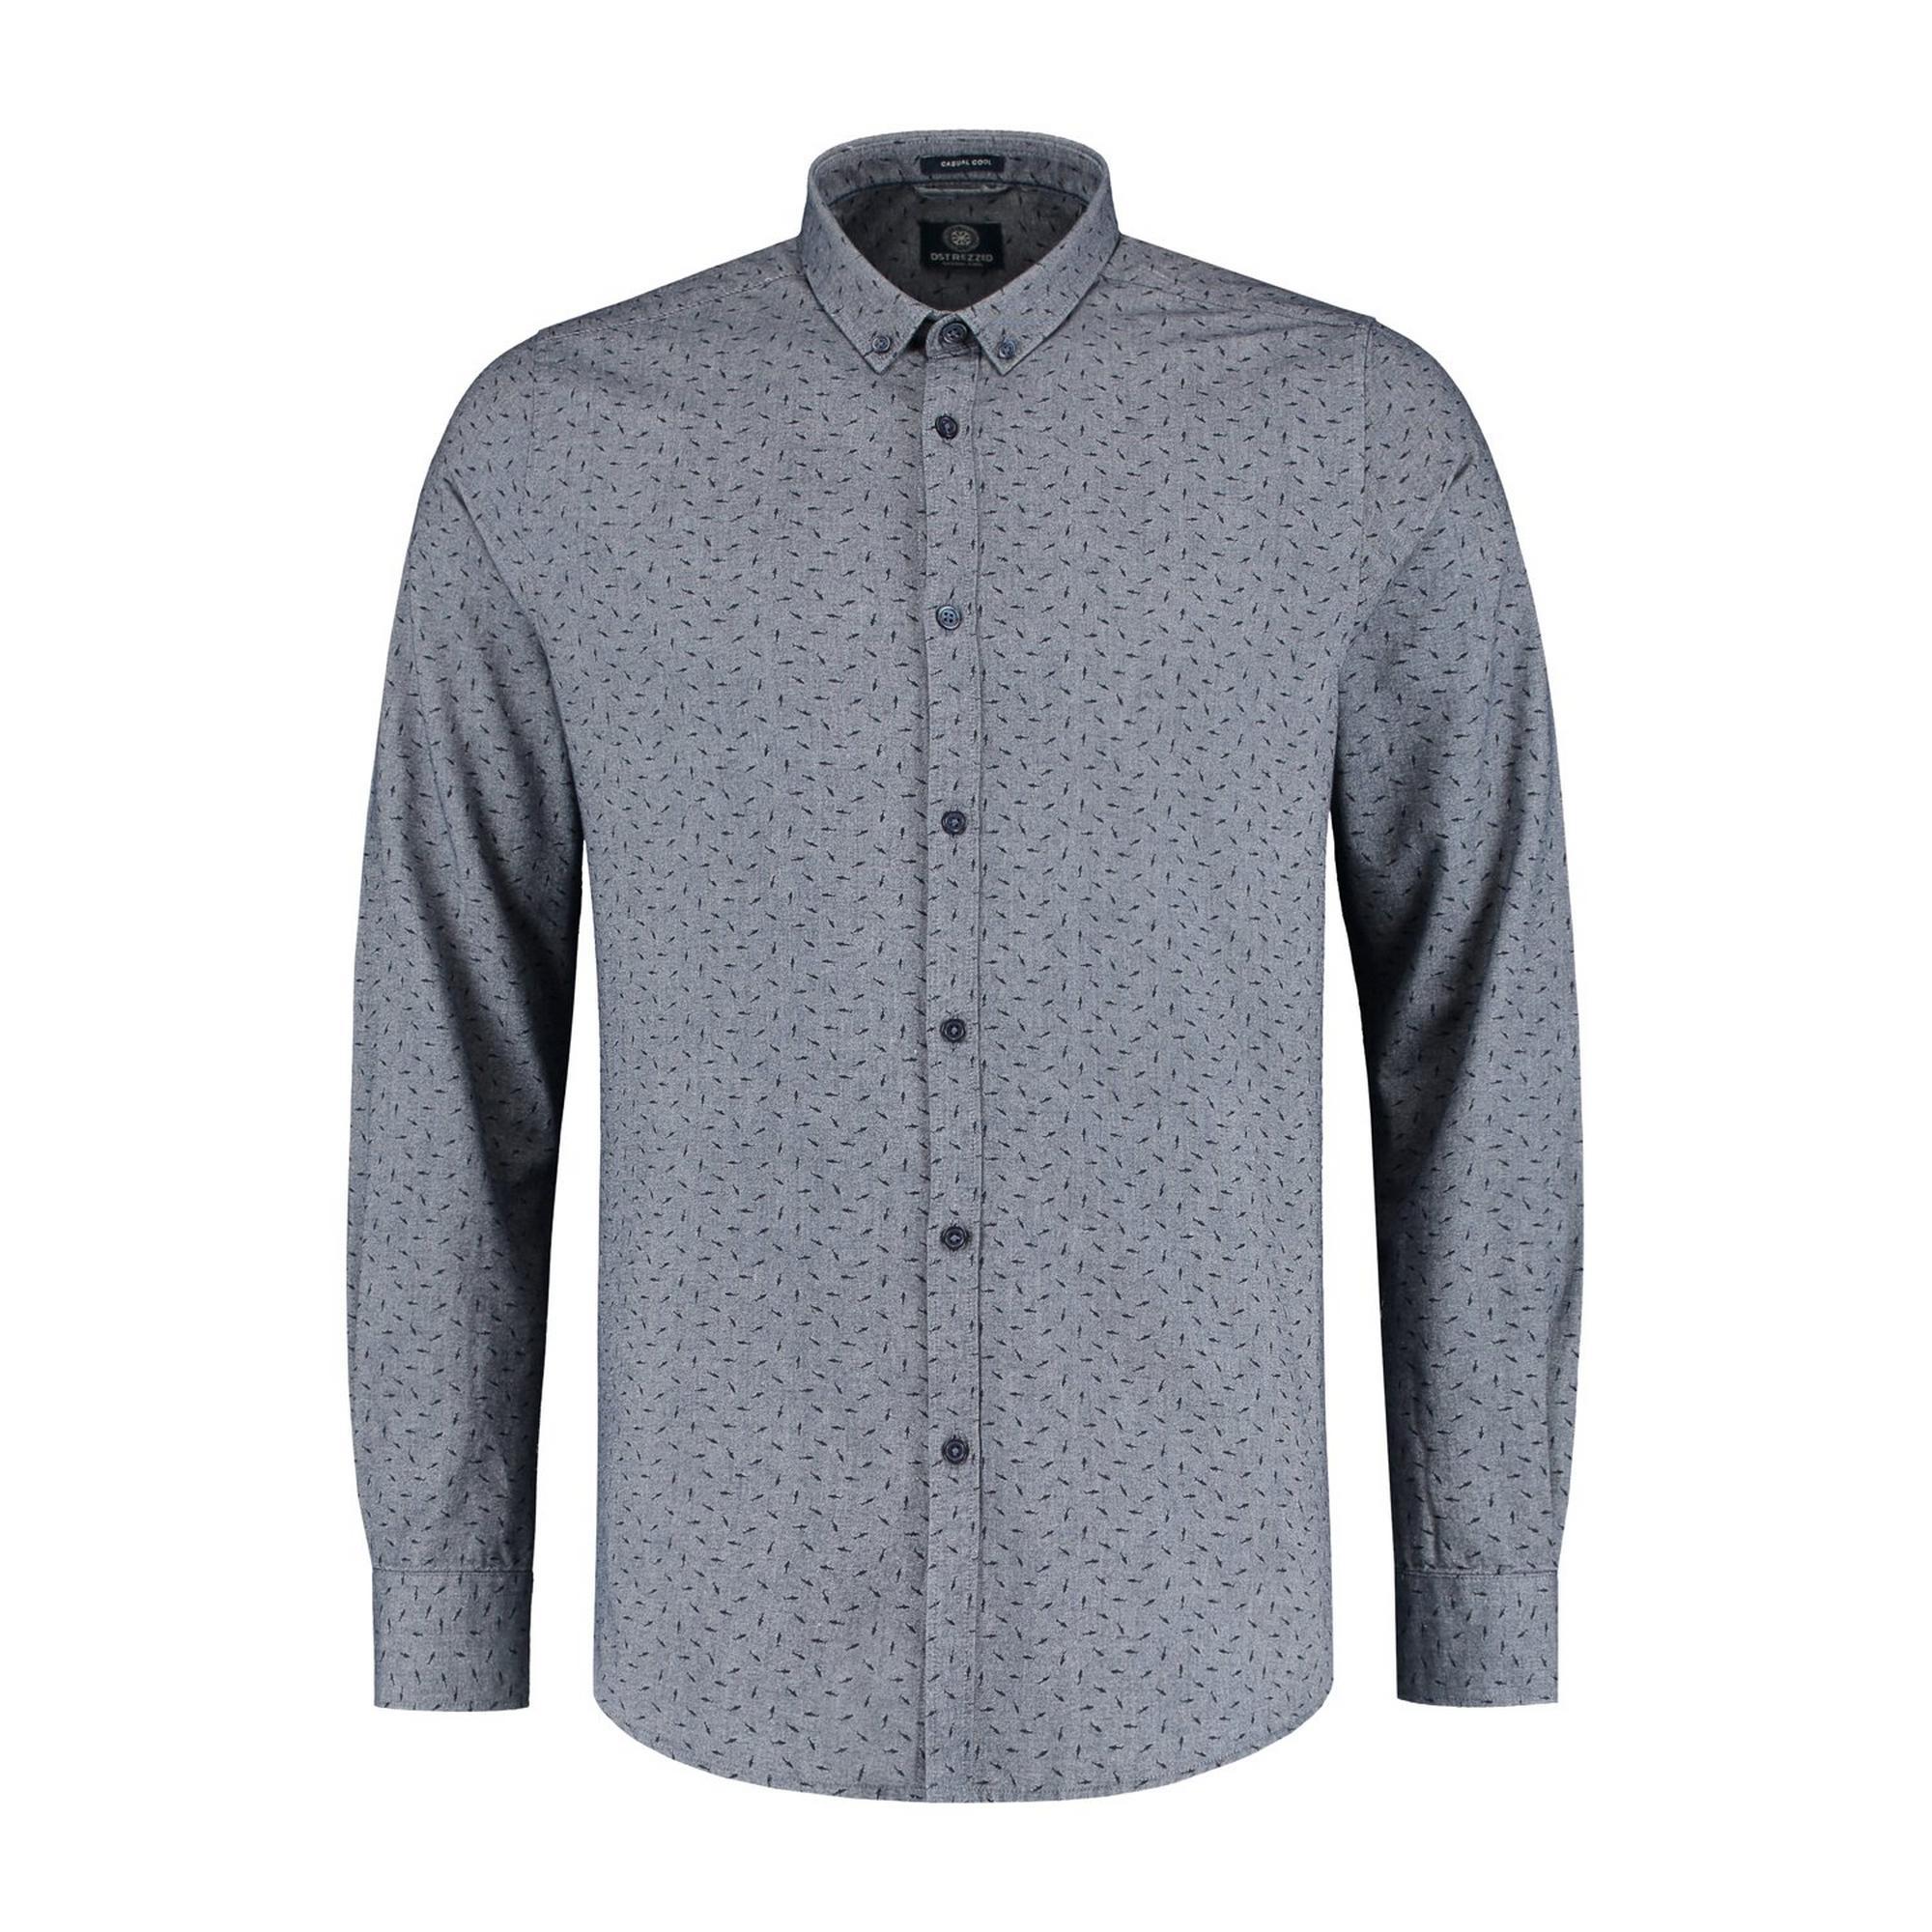 Men's Shark Chambray Woven Long Sleeve Shirt